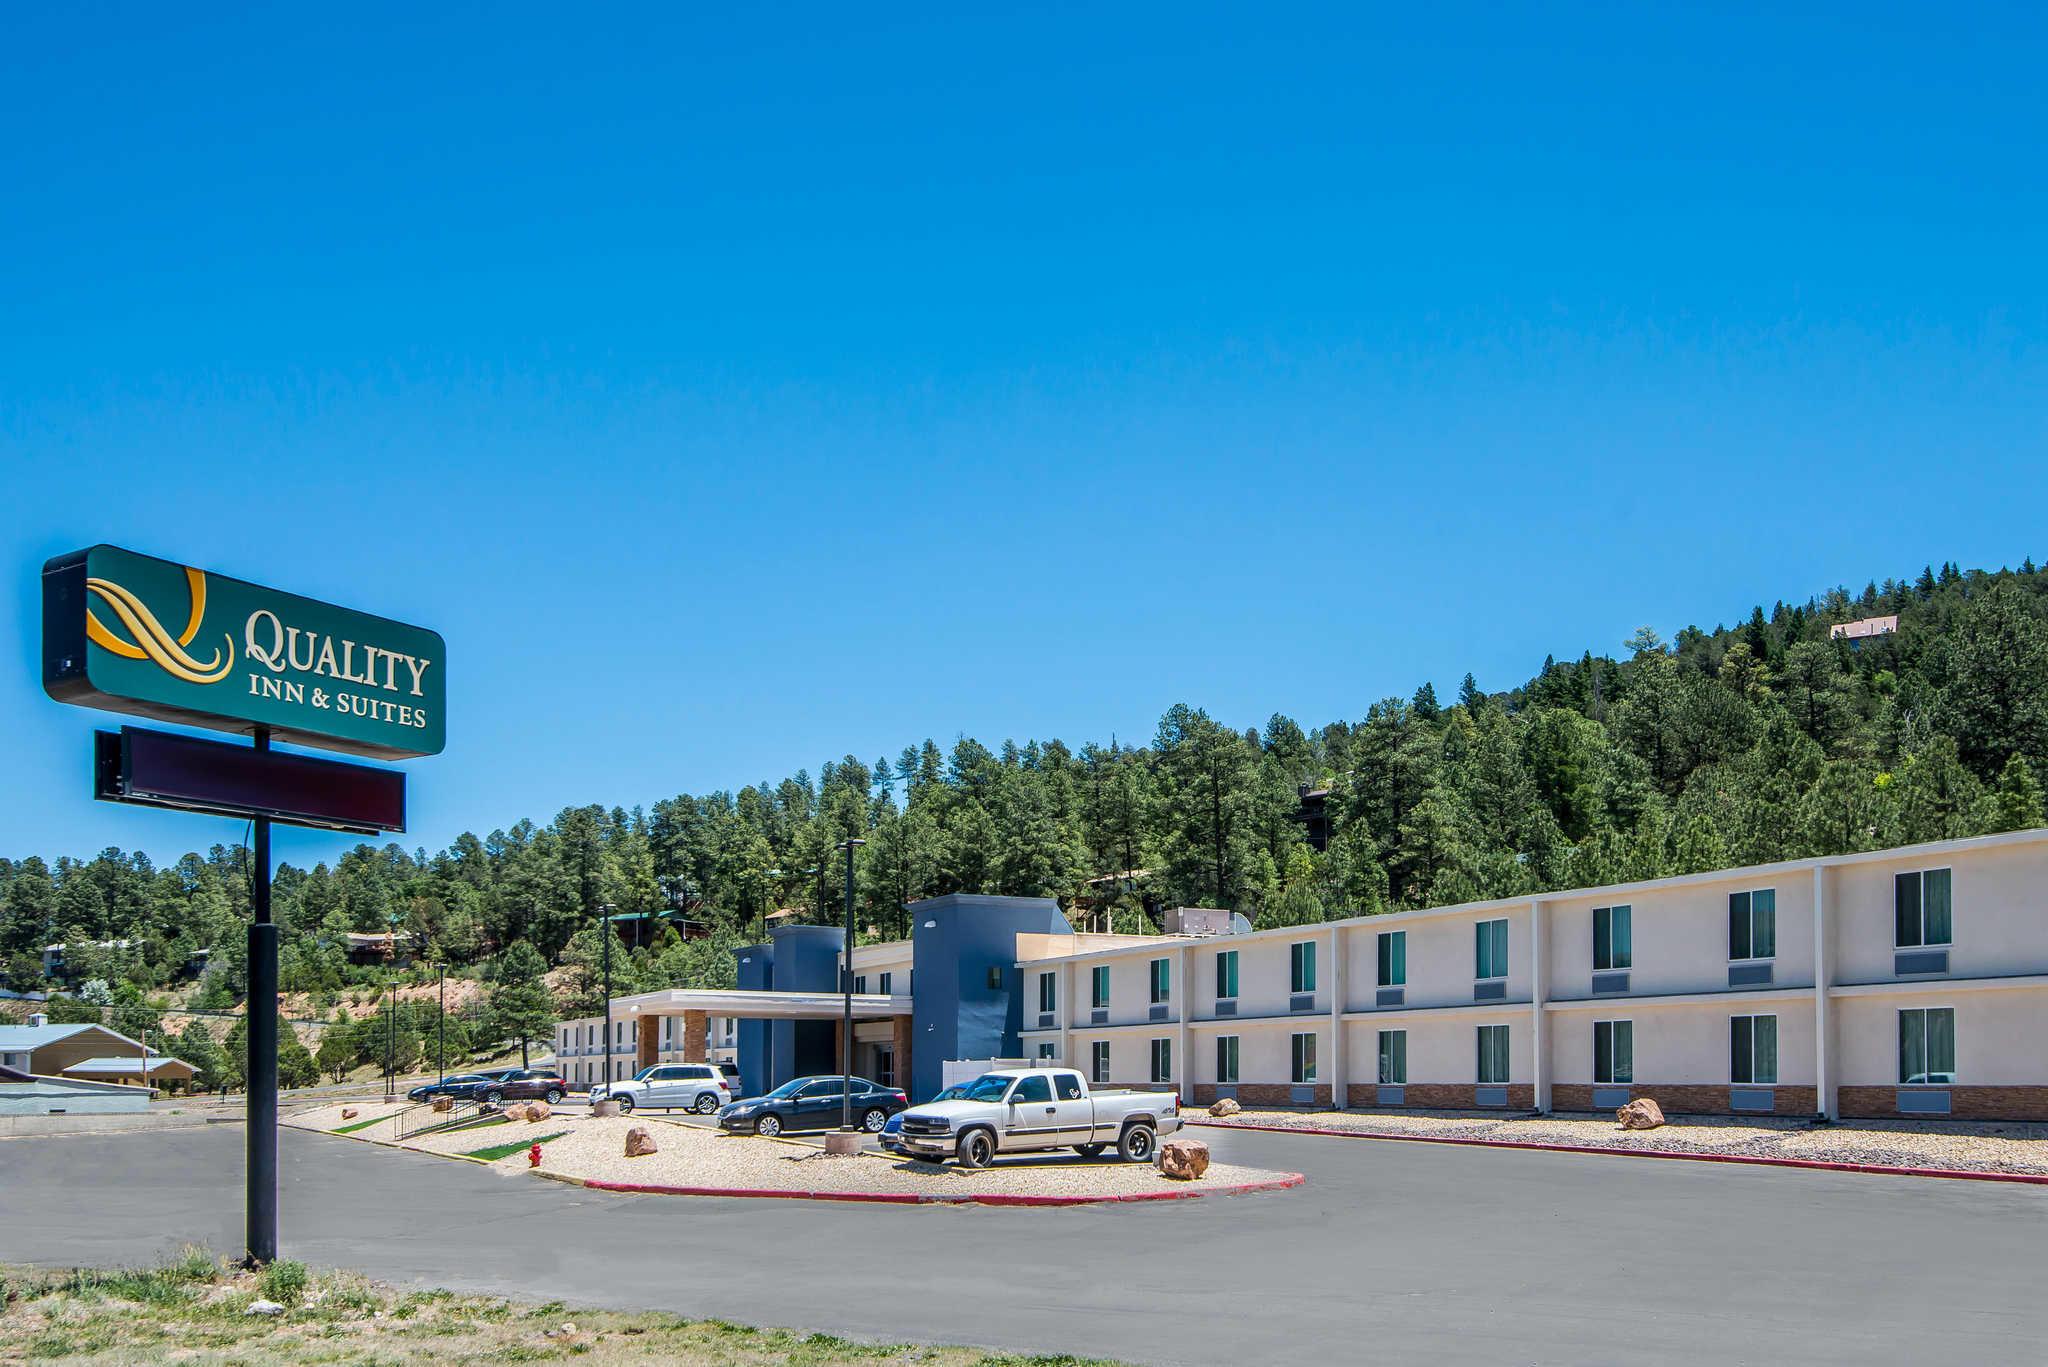 Quality Inn & Suites - Ruidoso Hwy 70 image 0